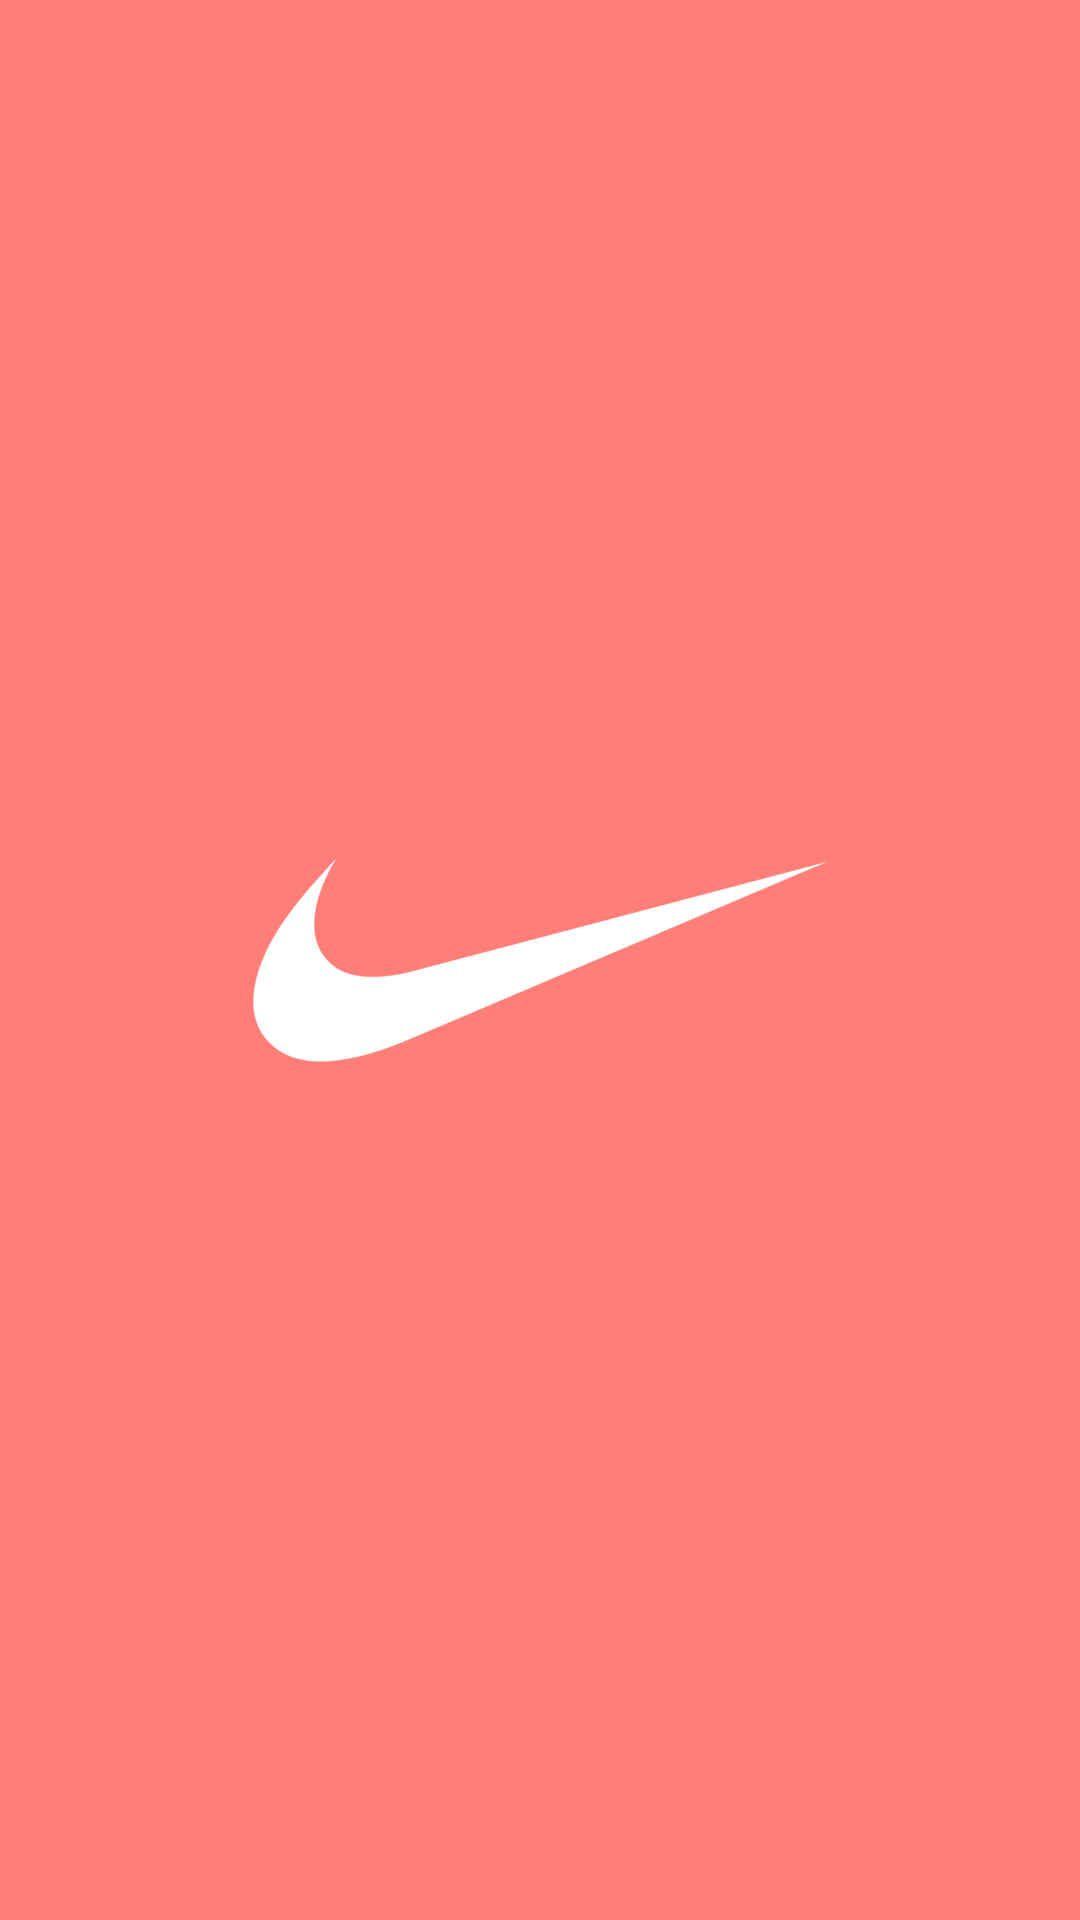 Nike ナイキ の高画質スマホ壁紙37枚 ナイキ 待ち受け Tumblrの壁紙 スマホ壁紙